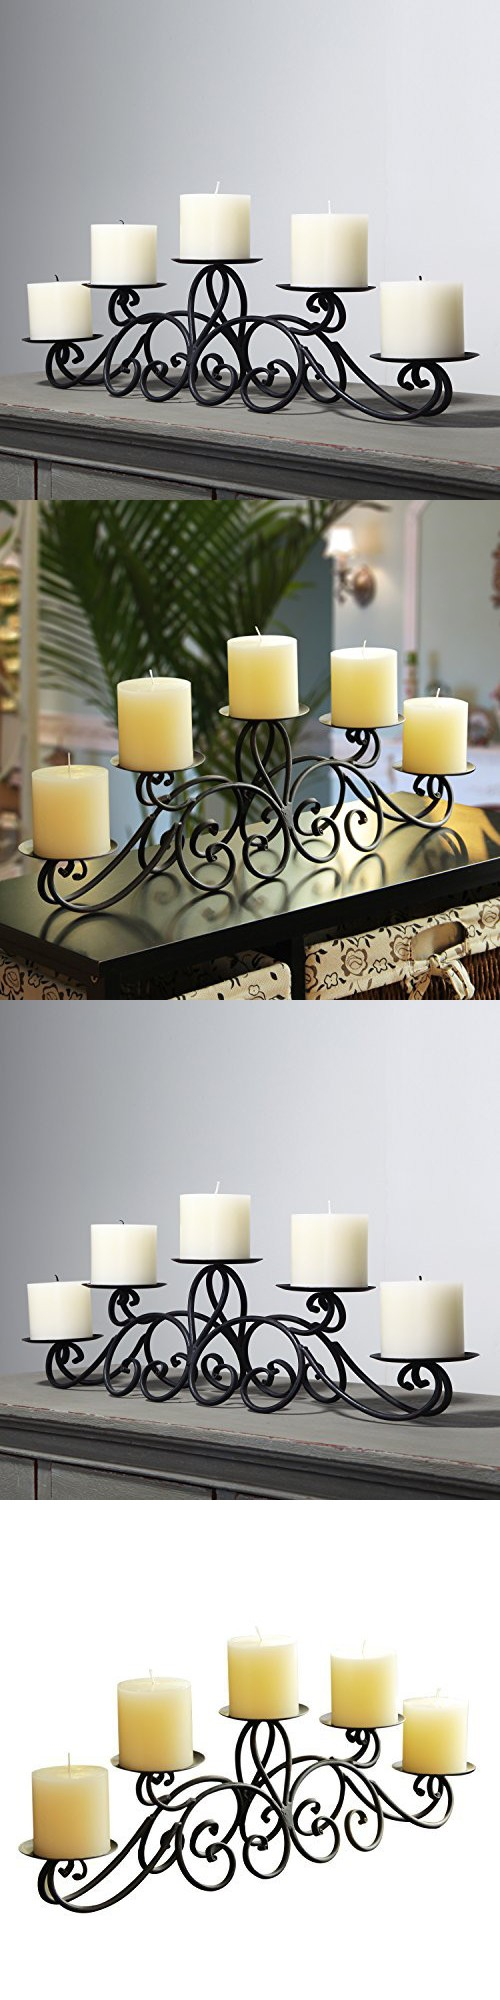 Adeco iron table desk top pyramid layout scroll design pillar